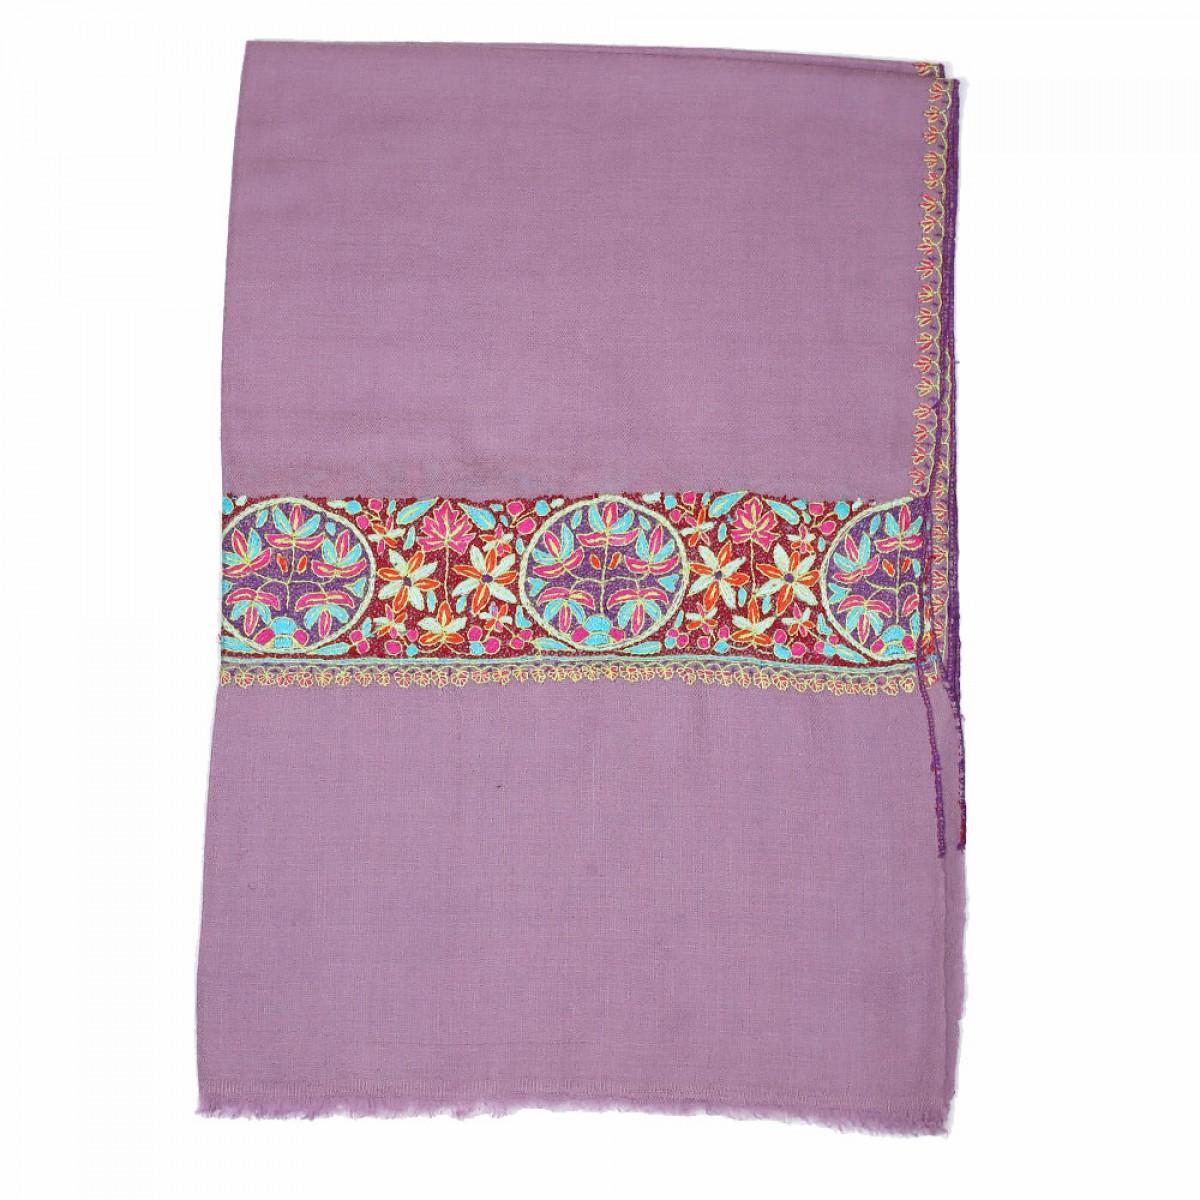 Embroidered Handloom Pashmina Stole - Mauve